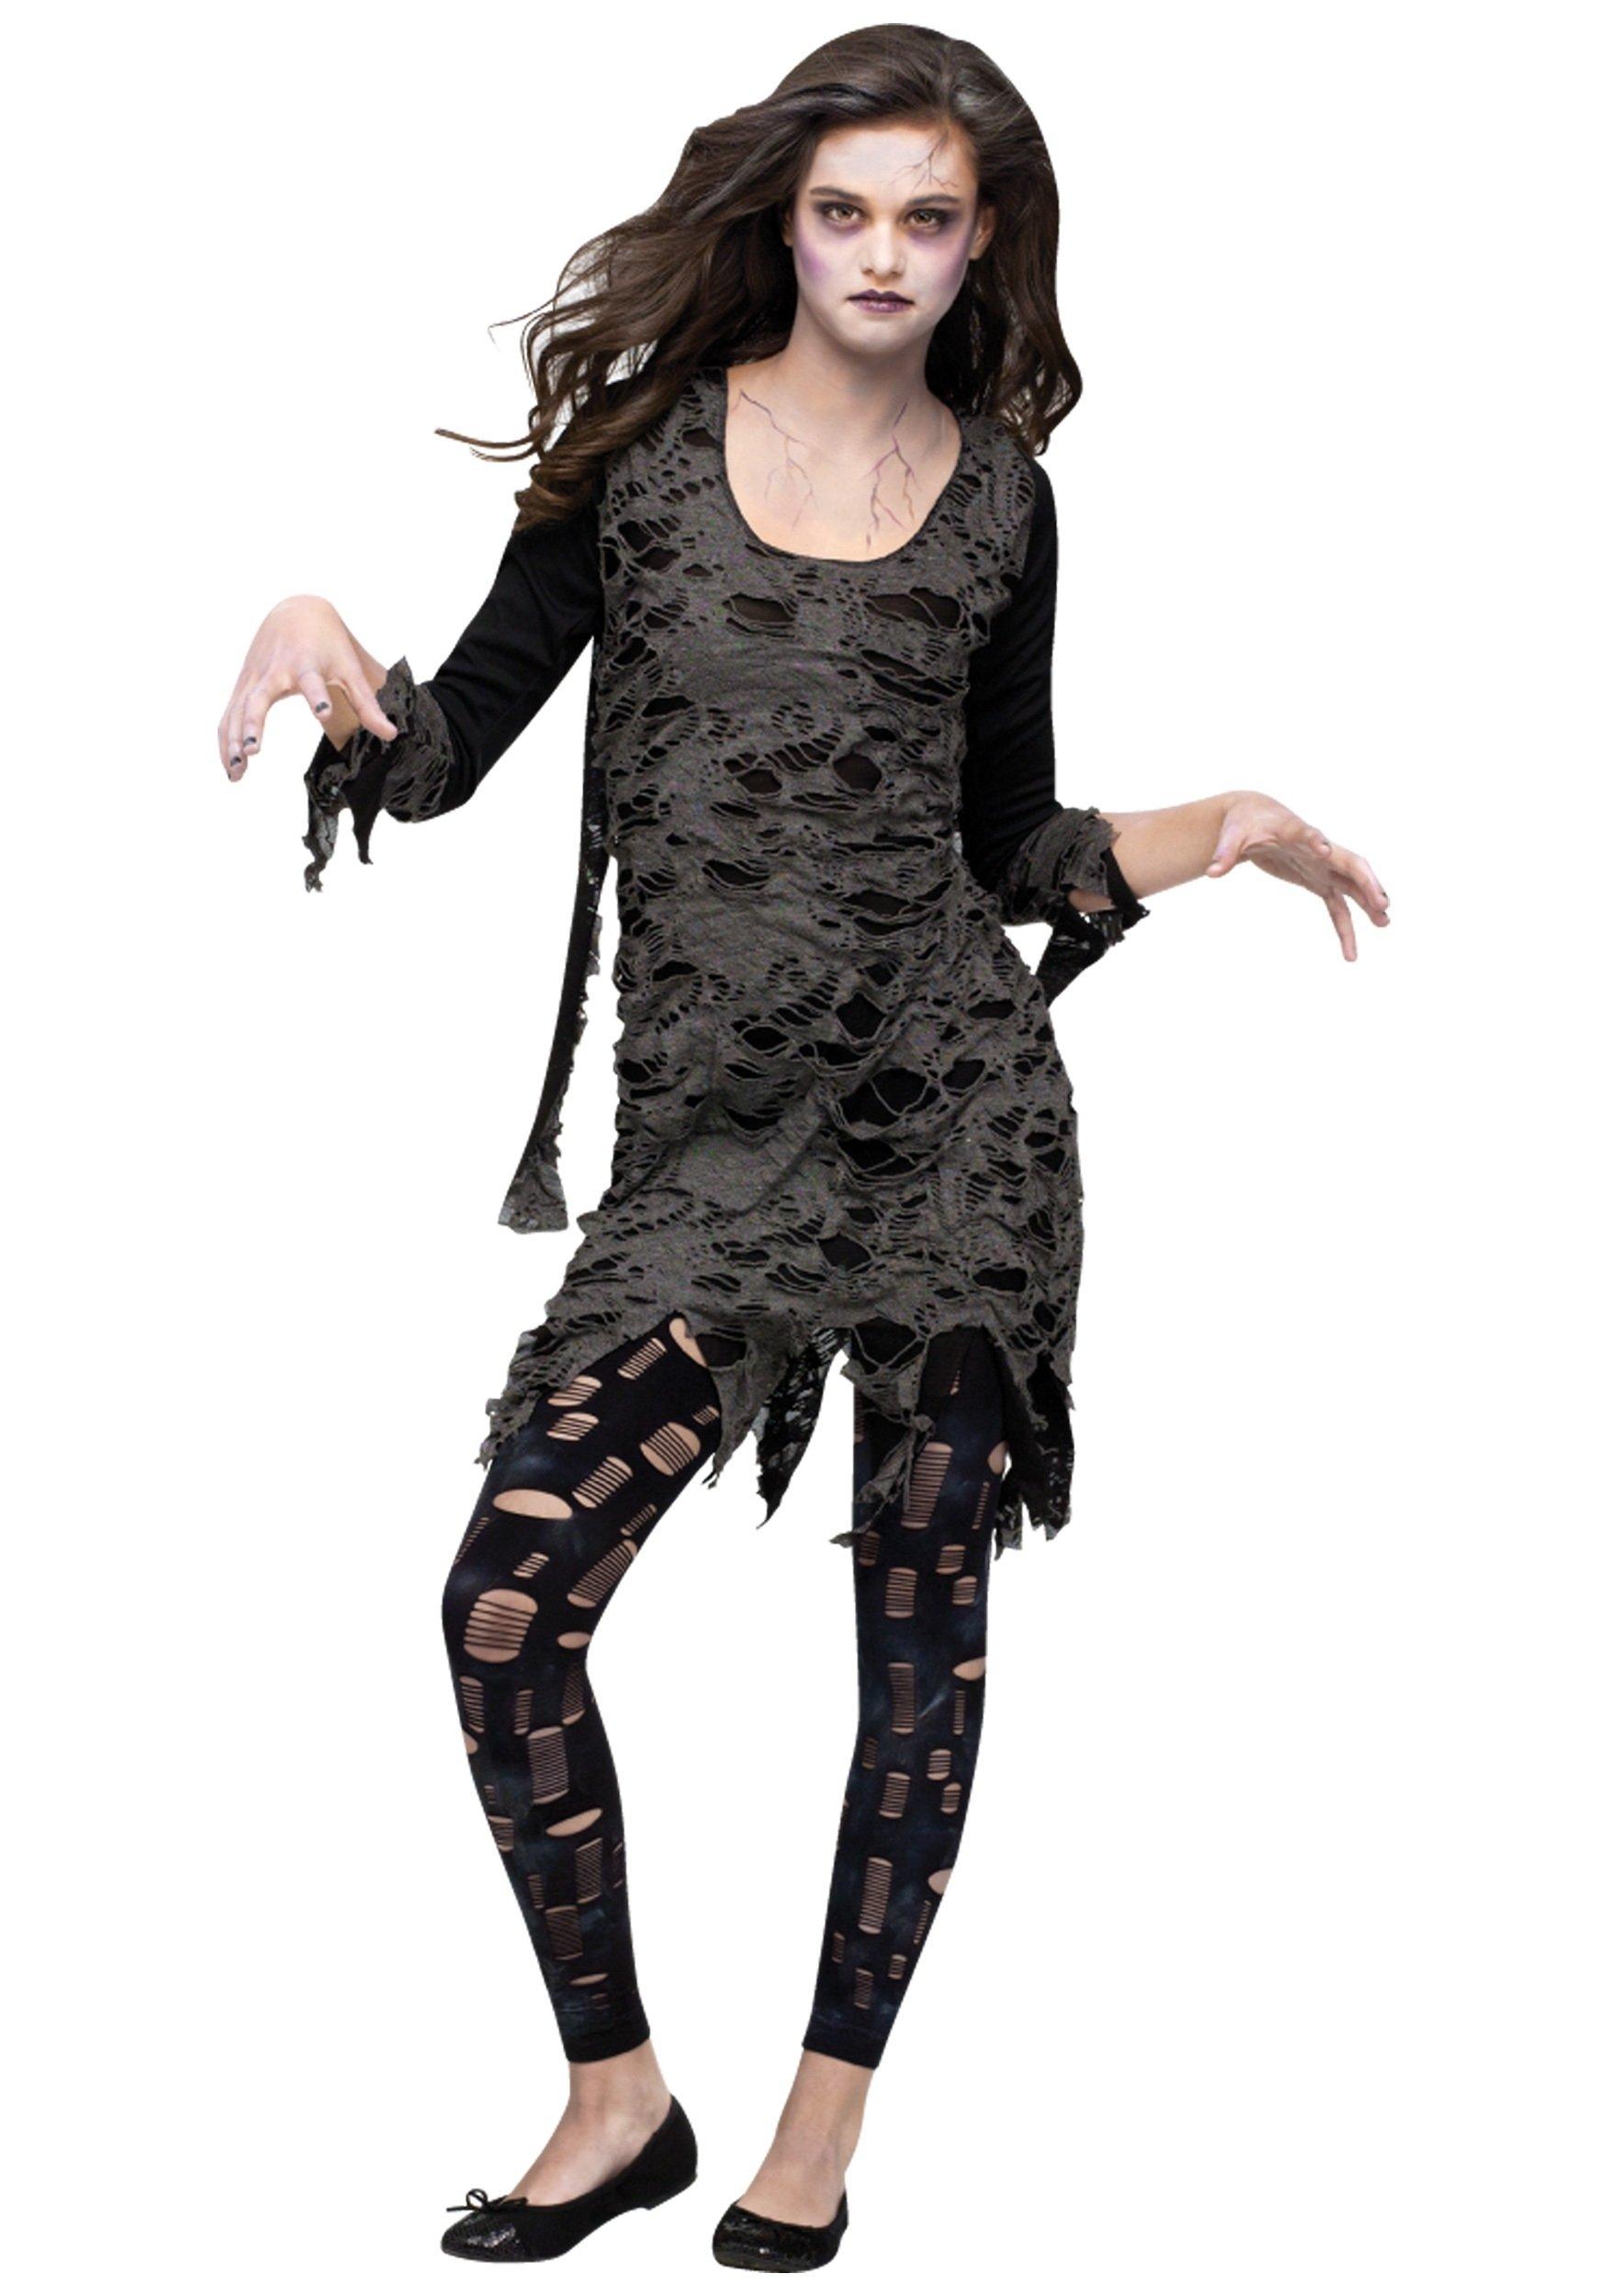 10 Fashionable Halloween Costumes Ideas For Teenage Girls teen living dead costume 2 2020